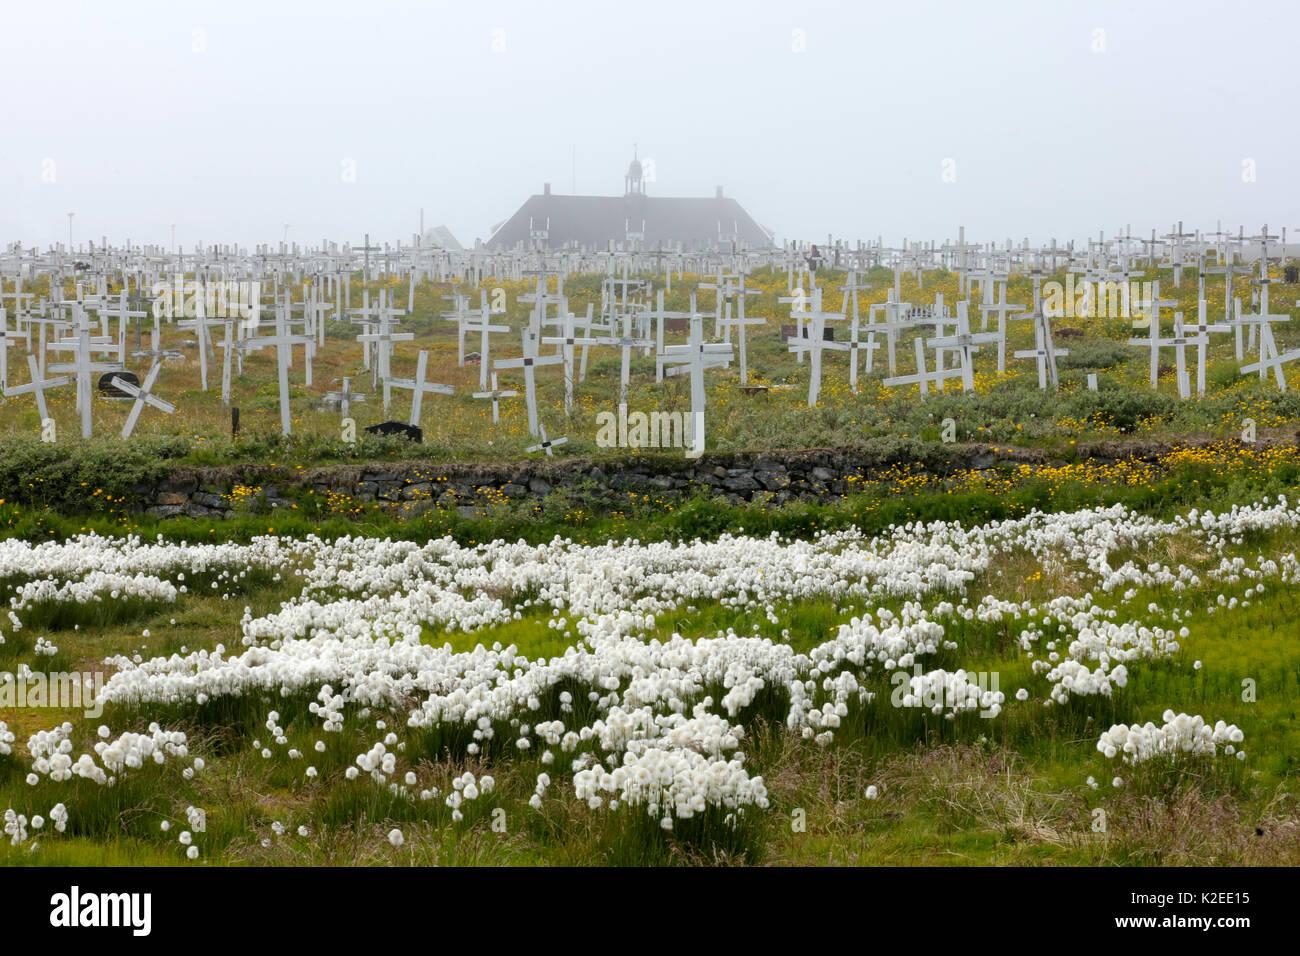 Greenlandic graveyard, Nuuk, Greenland, July 2016. - Stock Image